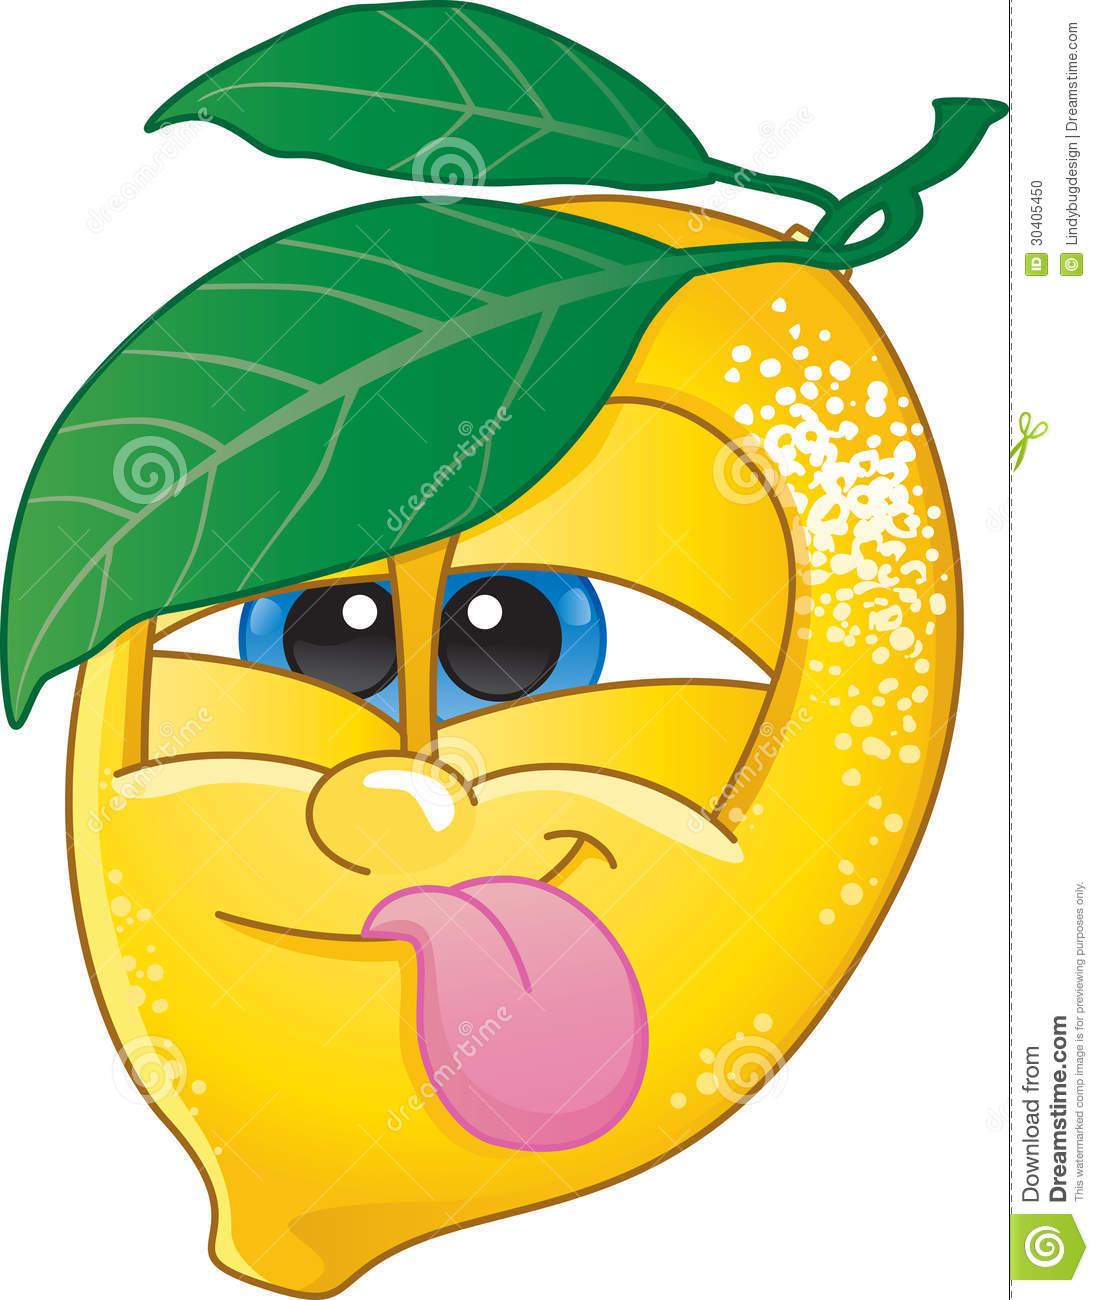 Lemon clipart with cute face.